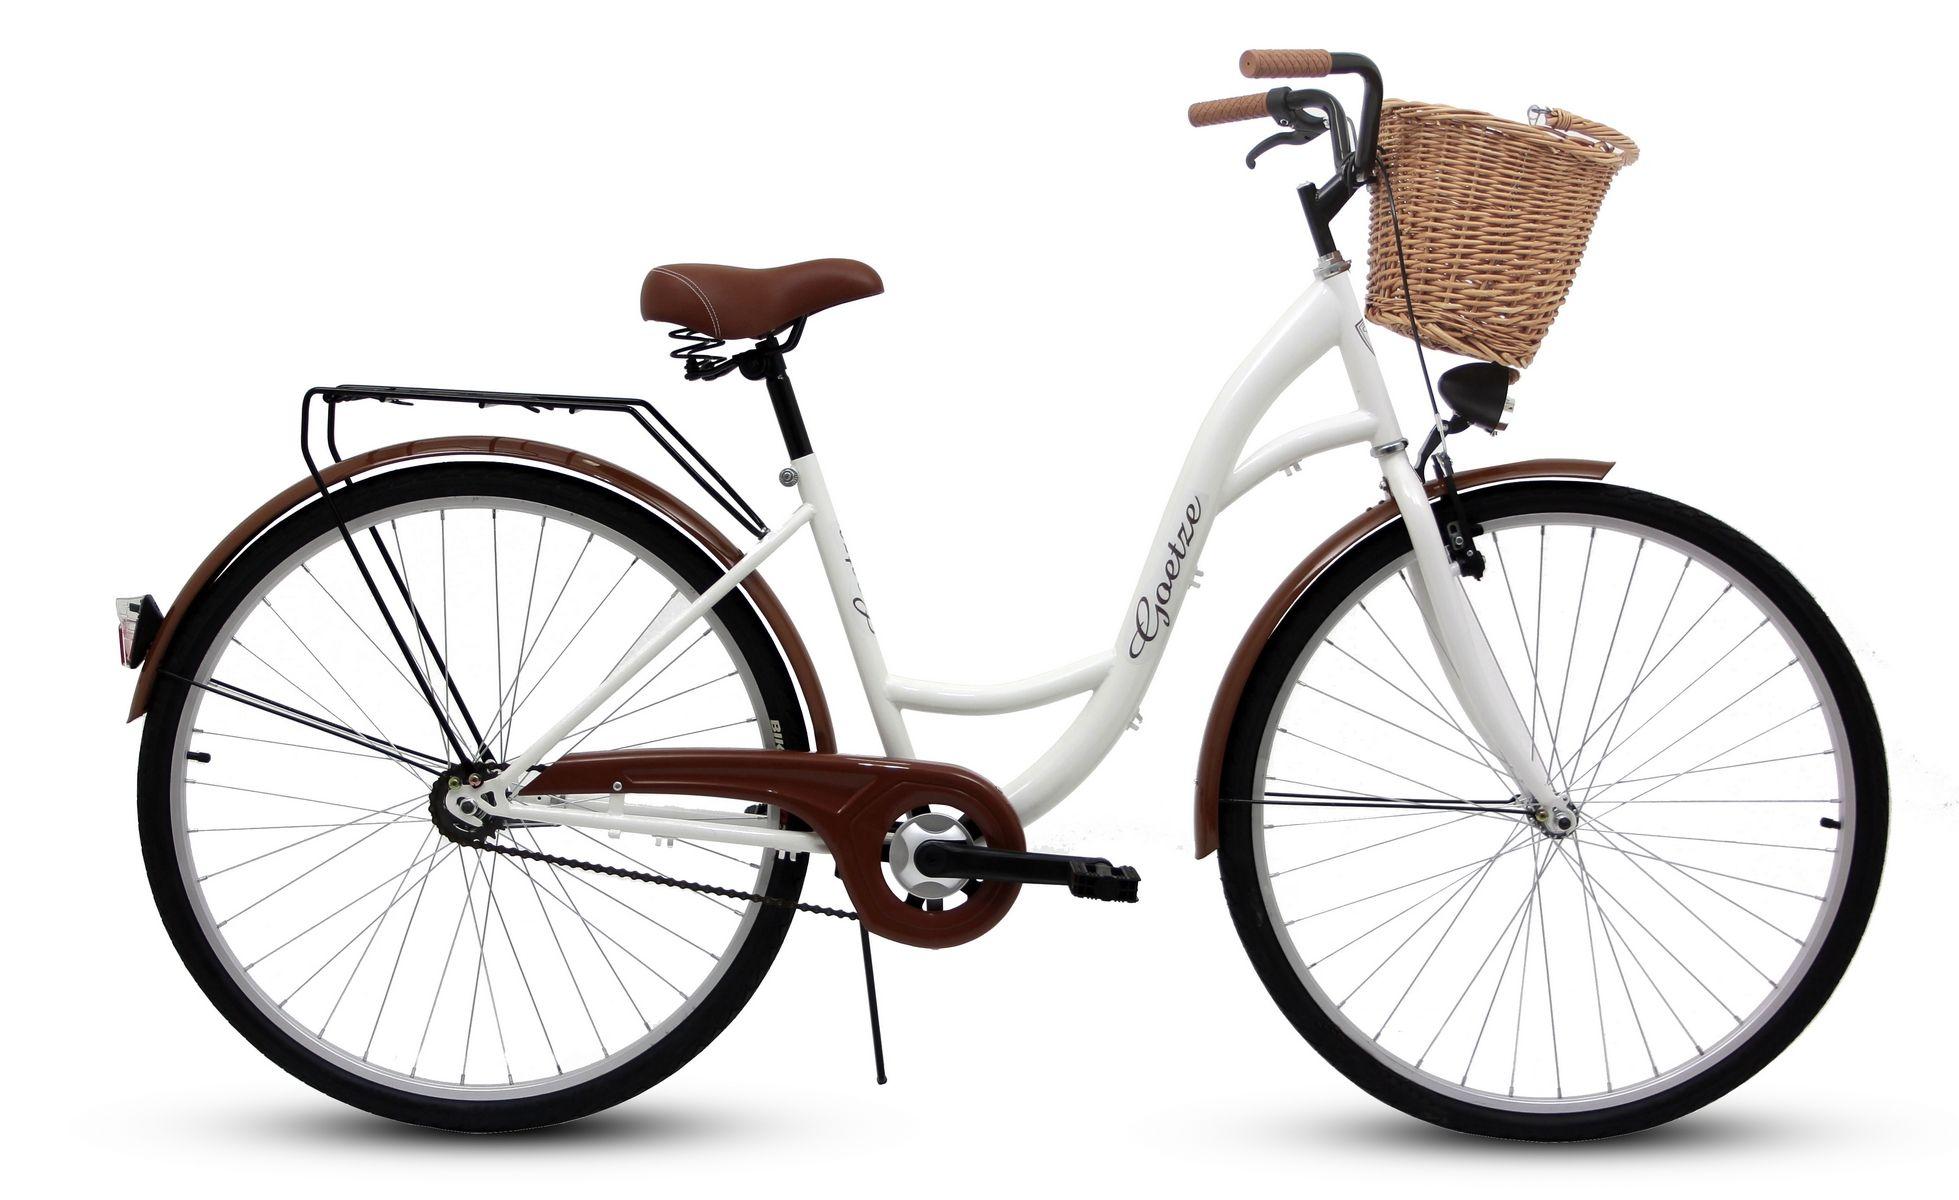 Damski Rower Miejski Goetze 28 Eco Damka Kosz Bicycle Vehicles